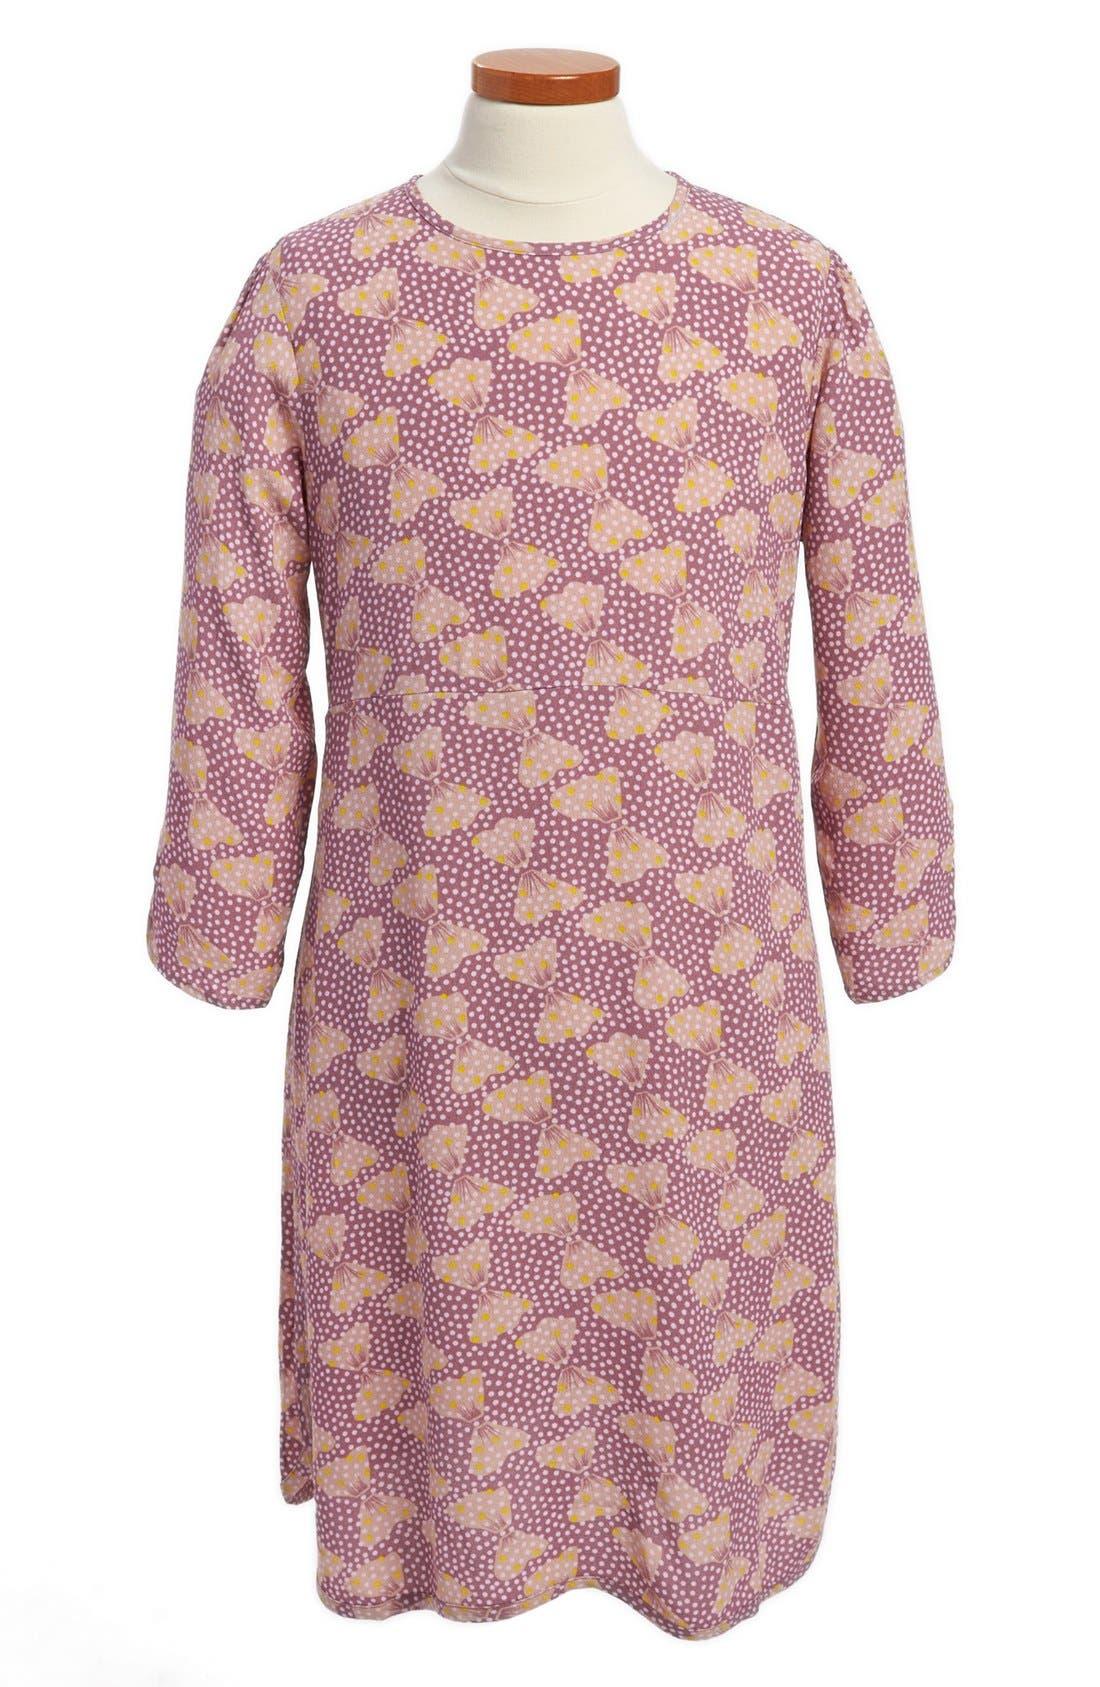 Main Image - Stella McCartney Kids 'Ida' Bow Print Dress (Toddler, Little Girls & Big Girls)